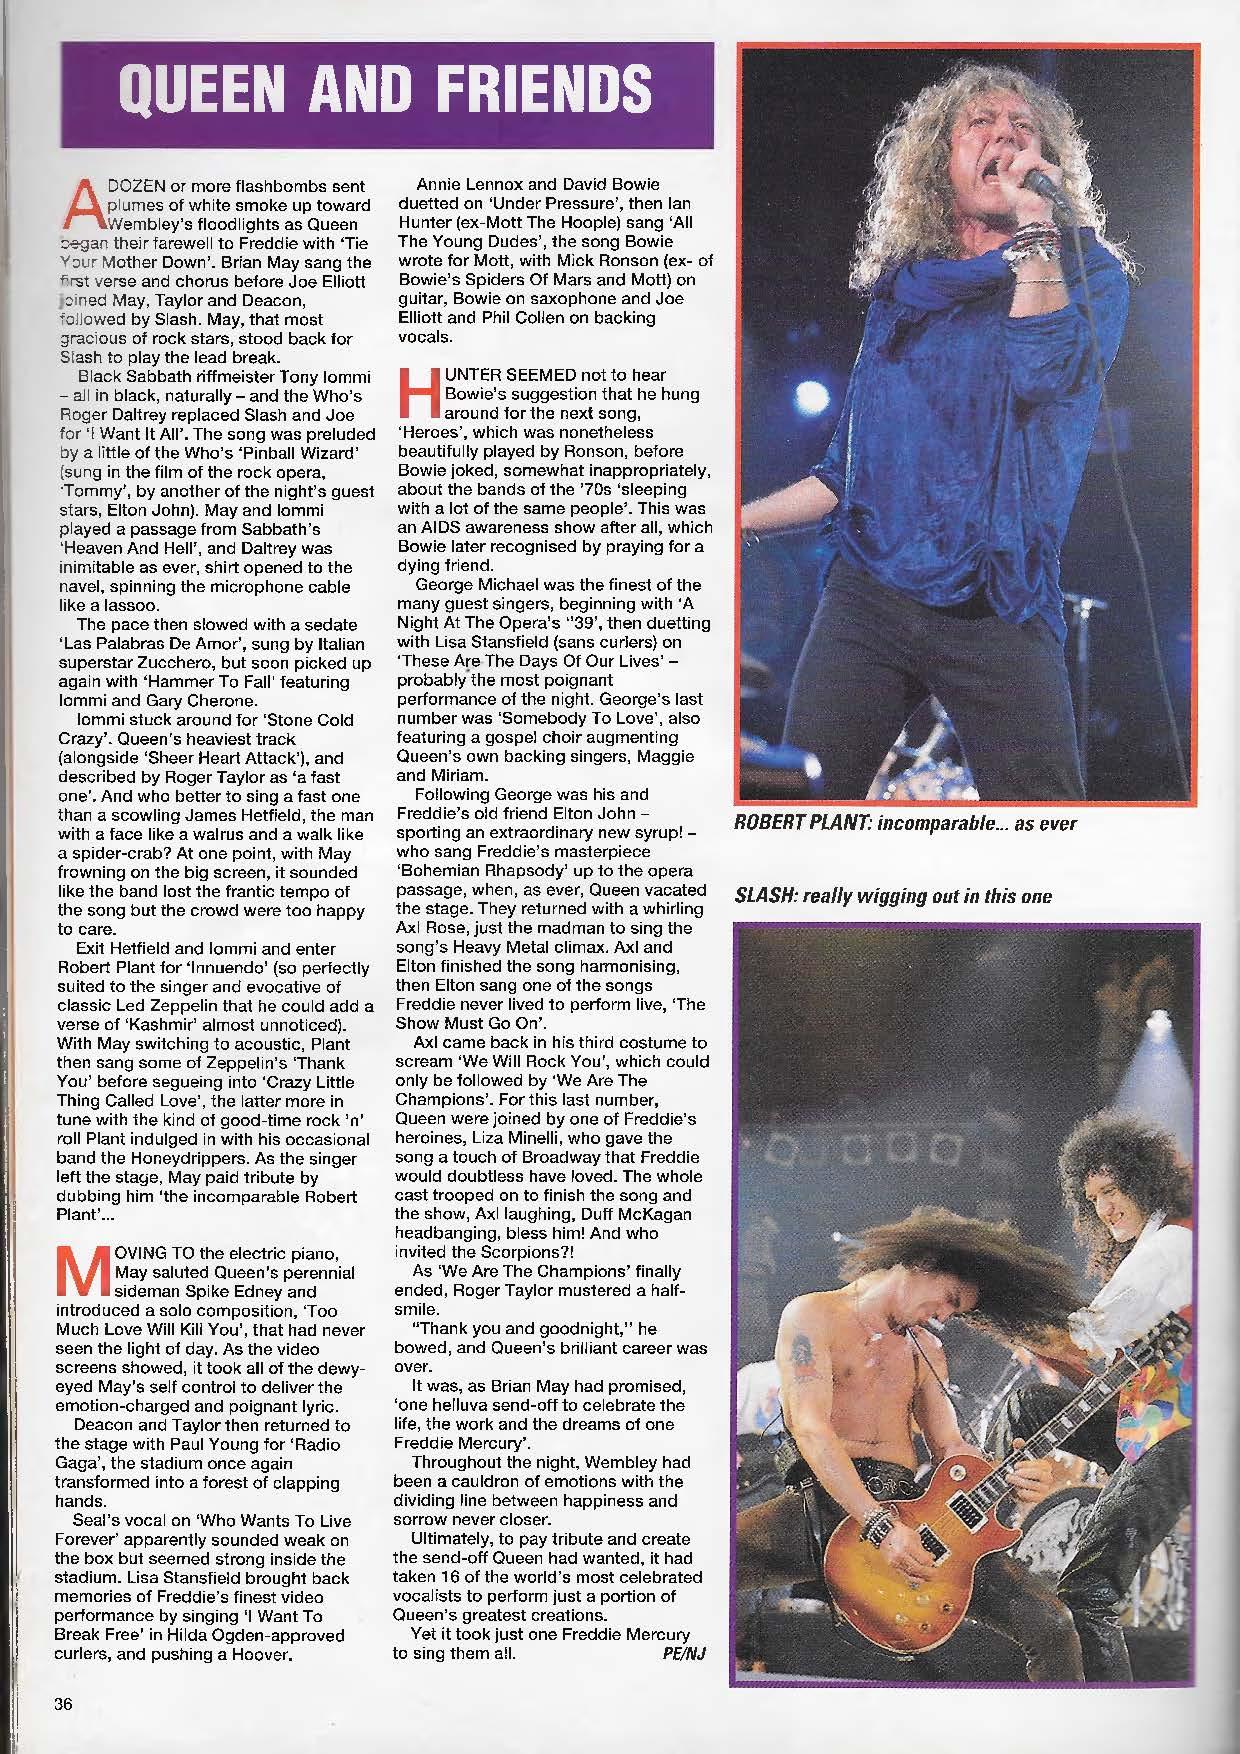 1992.04.20 - Freddie Mercury Tribute, Wembley Stadium, London, England UOVn1wHD_o